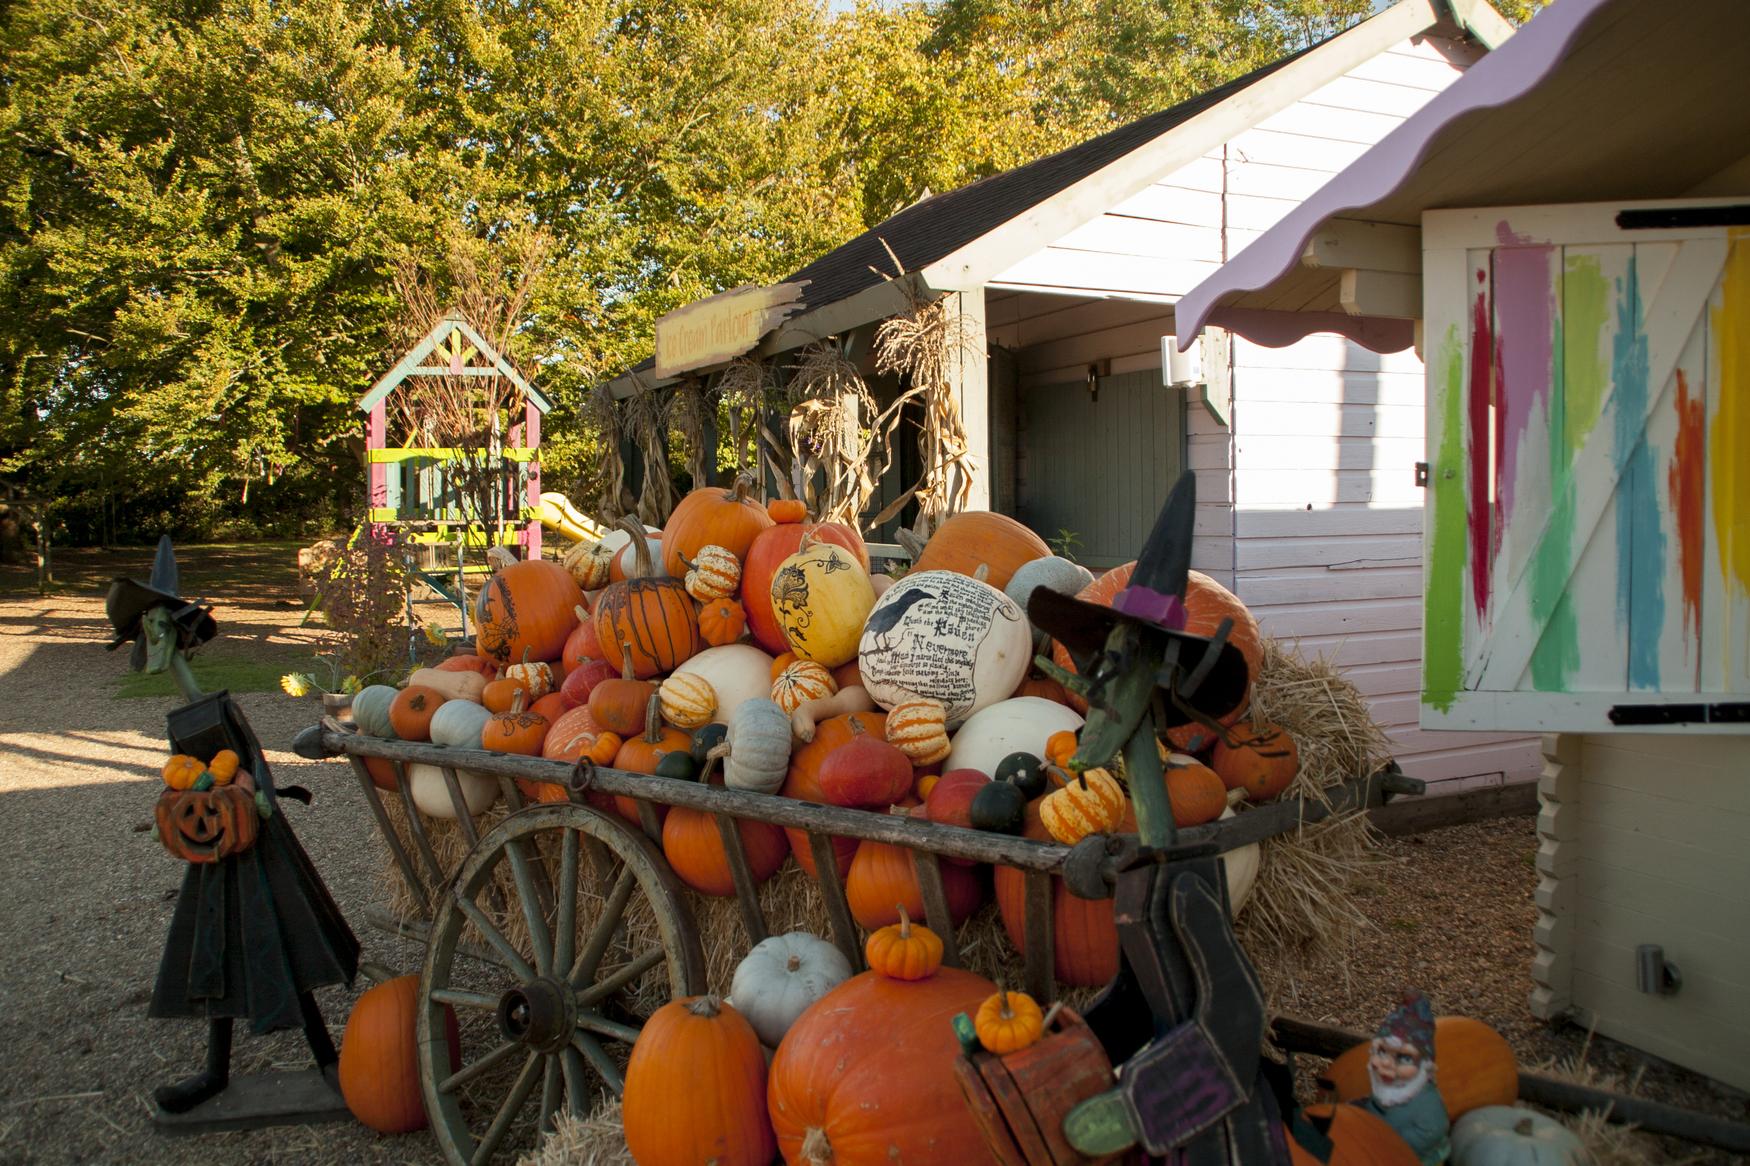 Crockford Bridge farm, west byfleet, weybridge, surrey, halloween, wonder woods, theatre, pumpkin patch